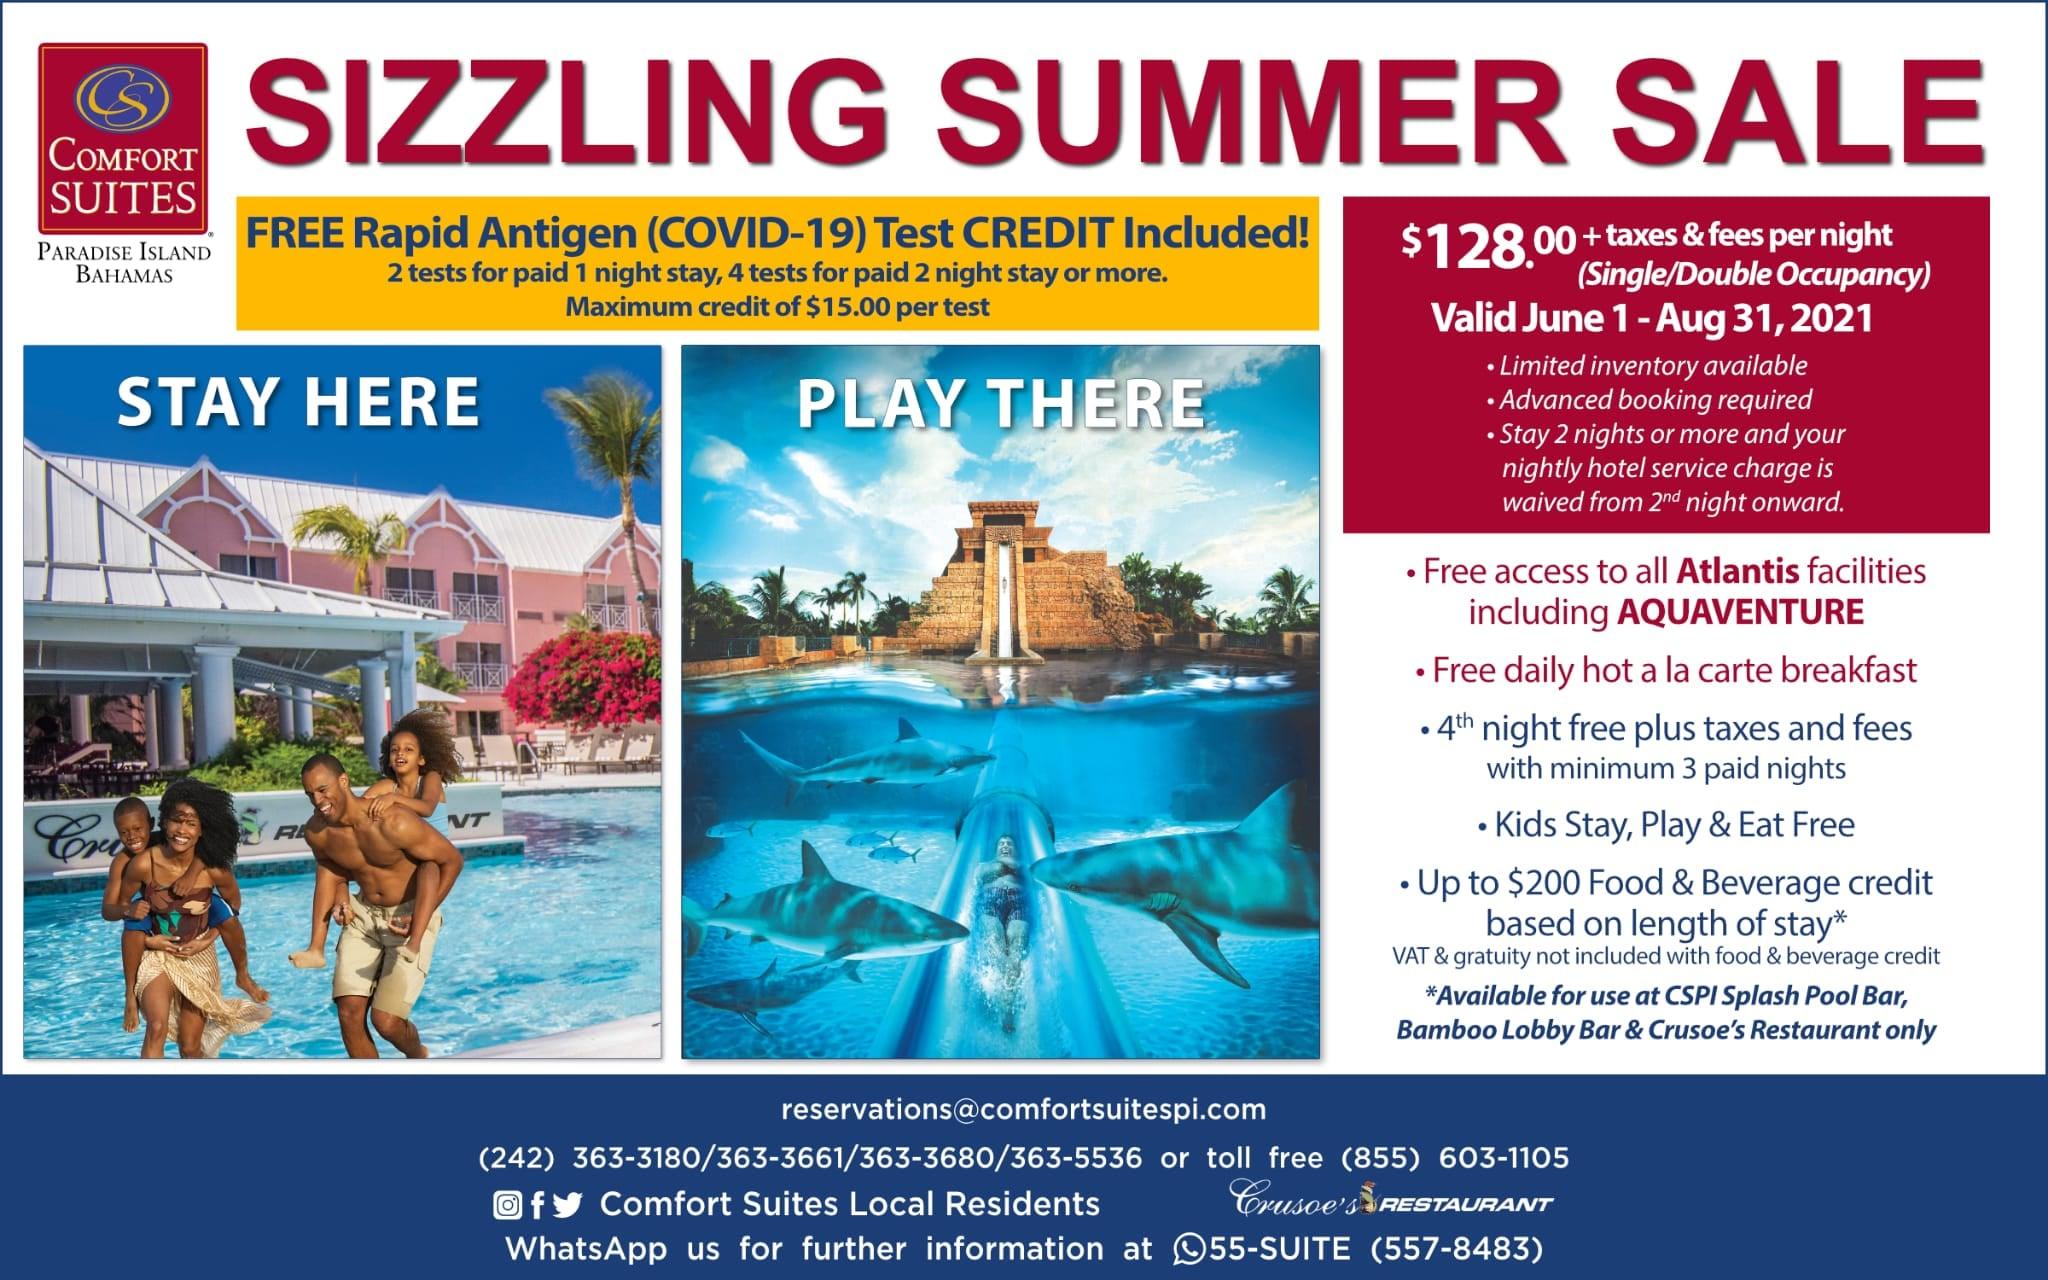 Comfort Suites Sizzling Summer Sale